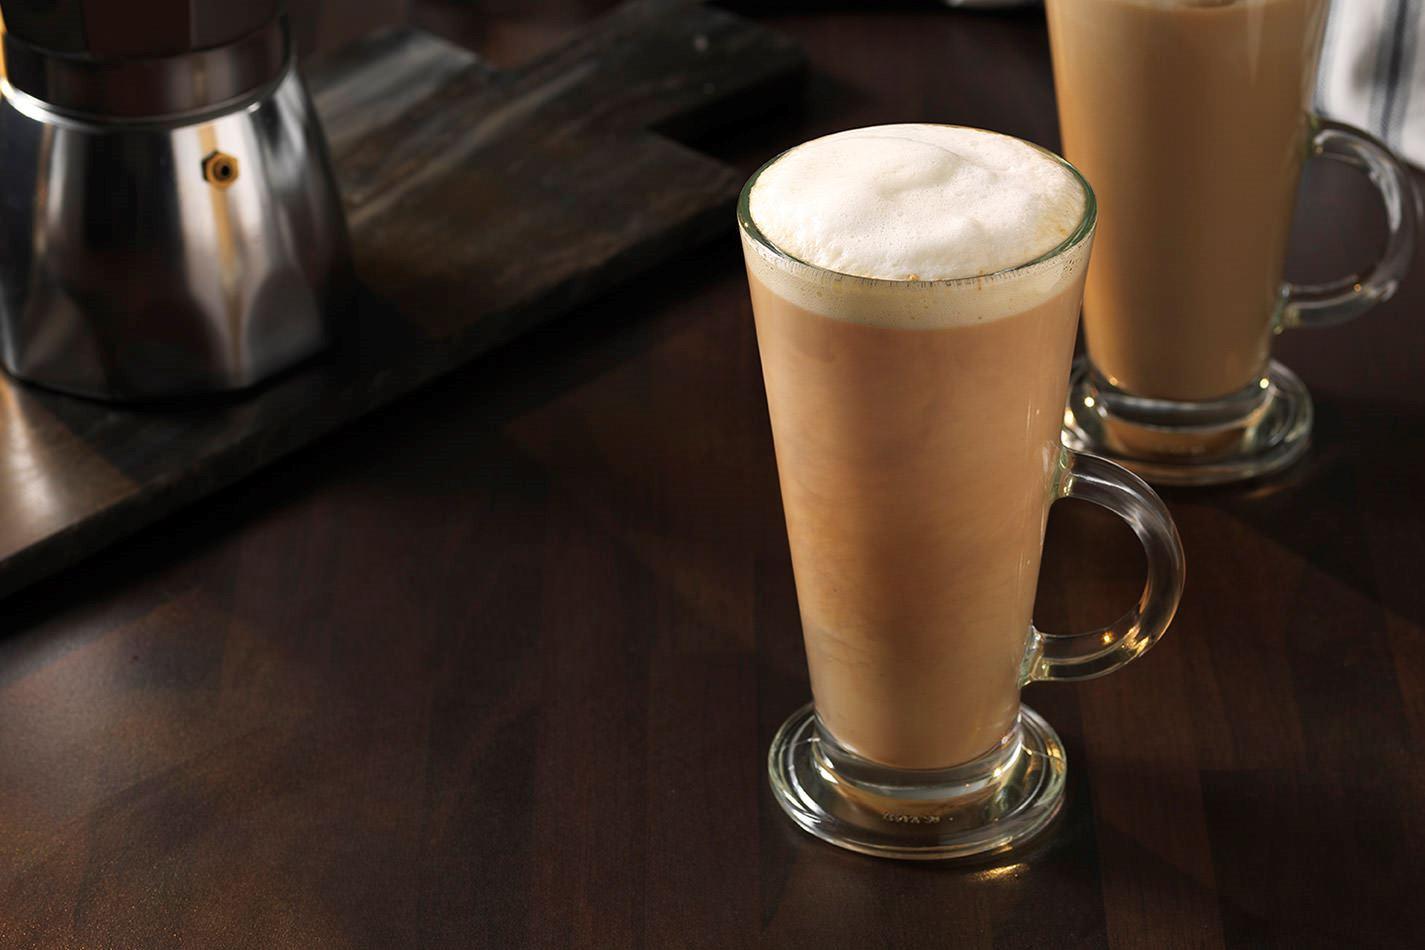 diageo_baileys--coffee-v2_clear-back-glass_test$$069a0000000f8qhiai